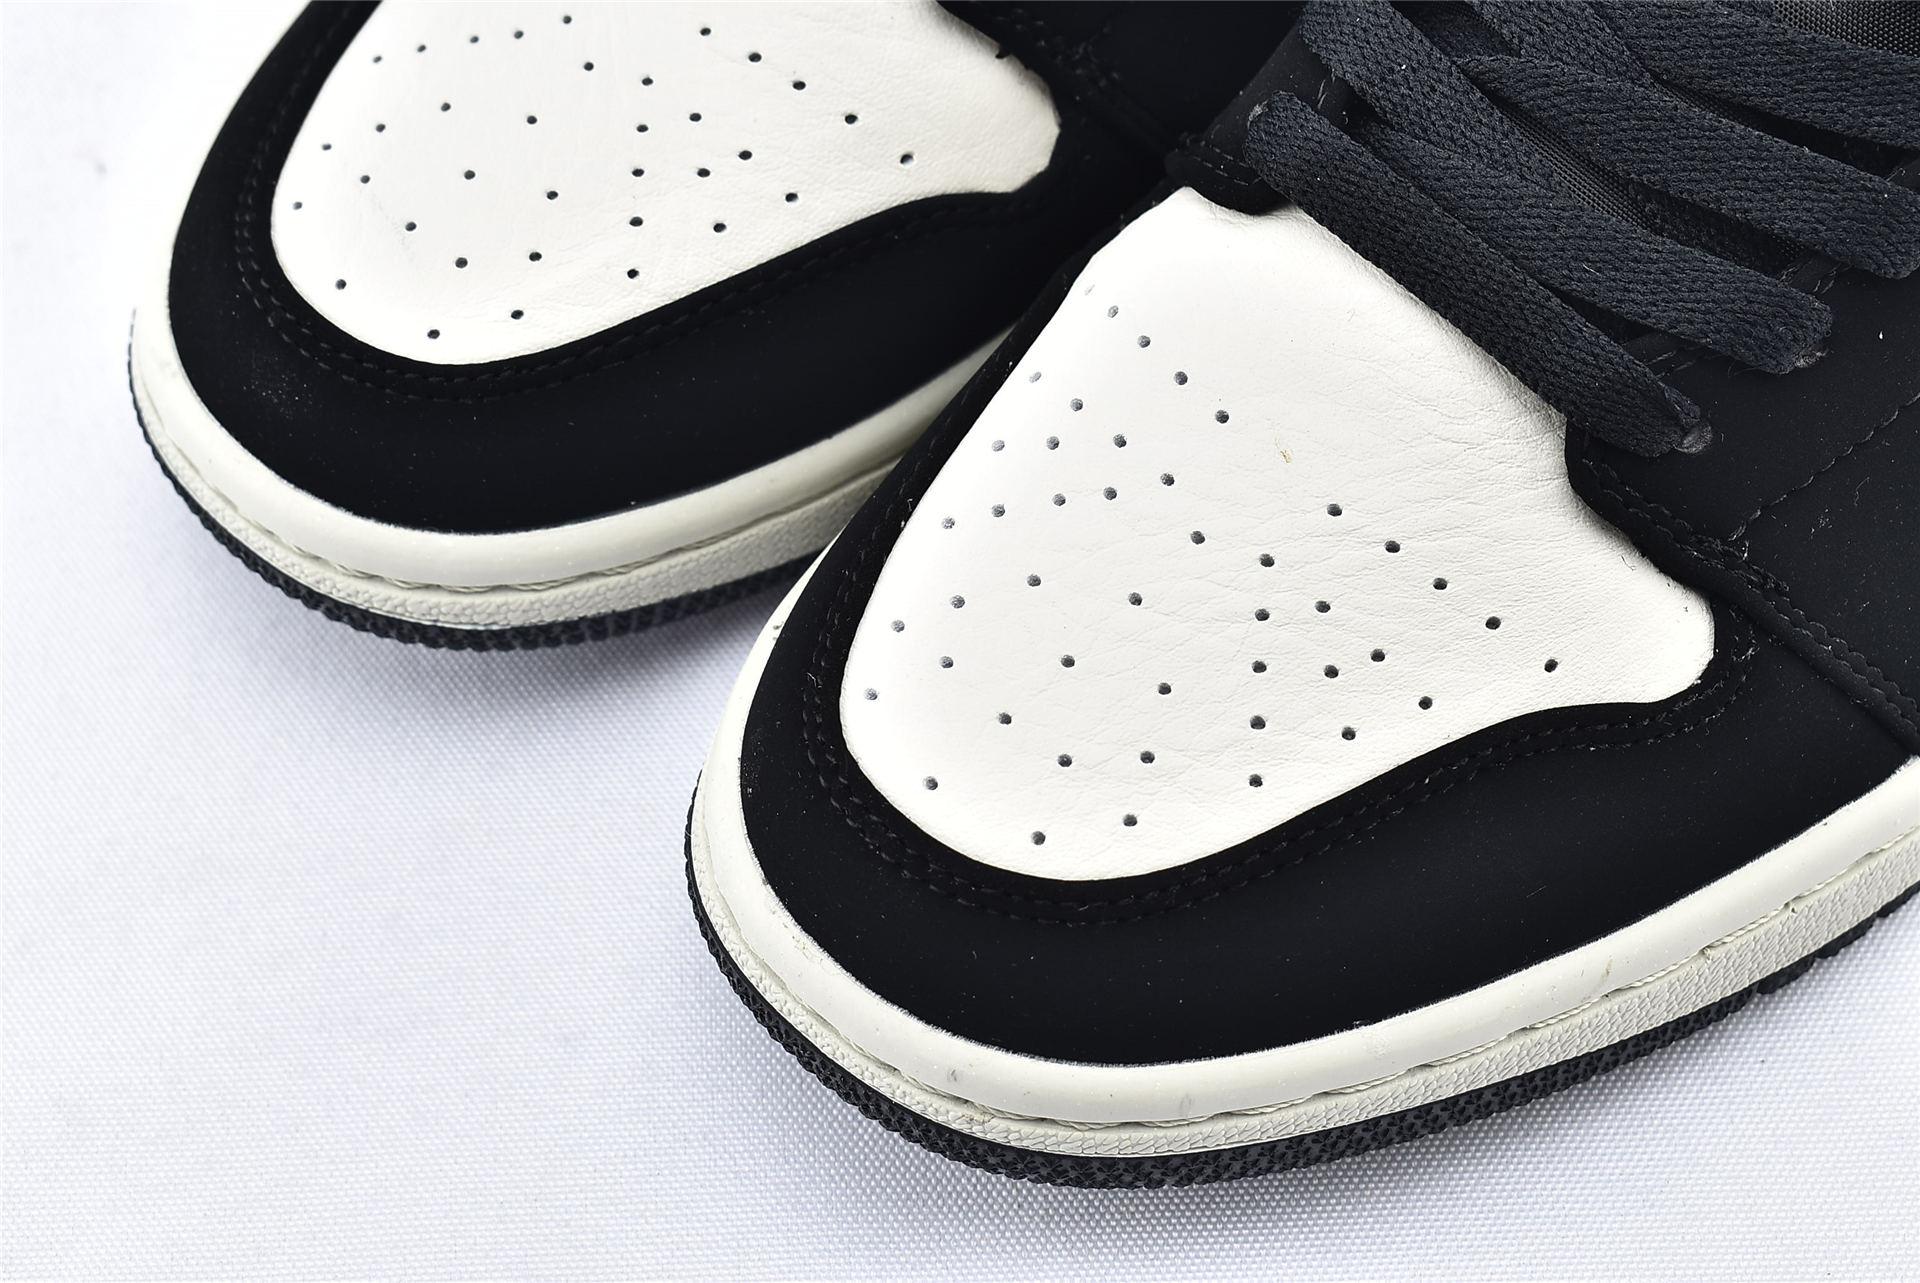 Air Jordan 1 Mid SE AJ1中帮篮球鞋/黑白绿迷彩  货号:CW7591-100  男女鞋  情侣款